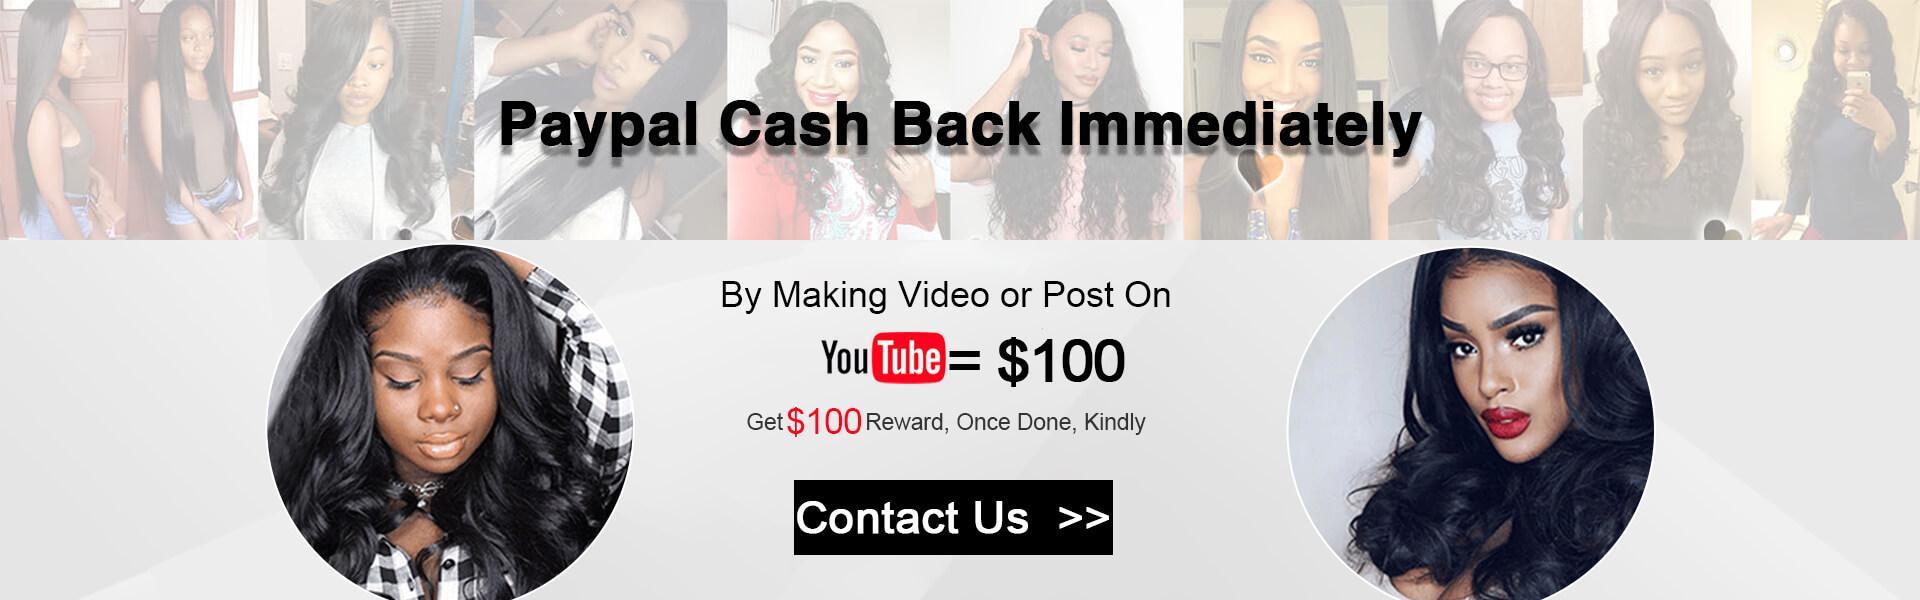 Youtube-cash-back-banner-pc